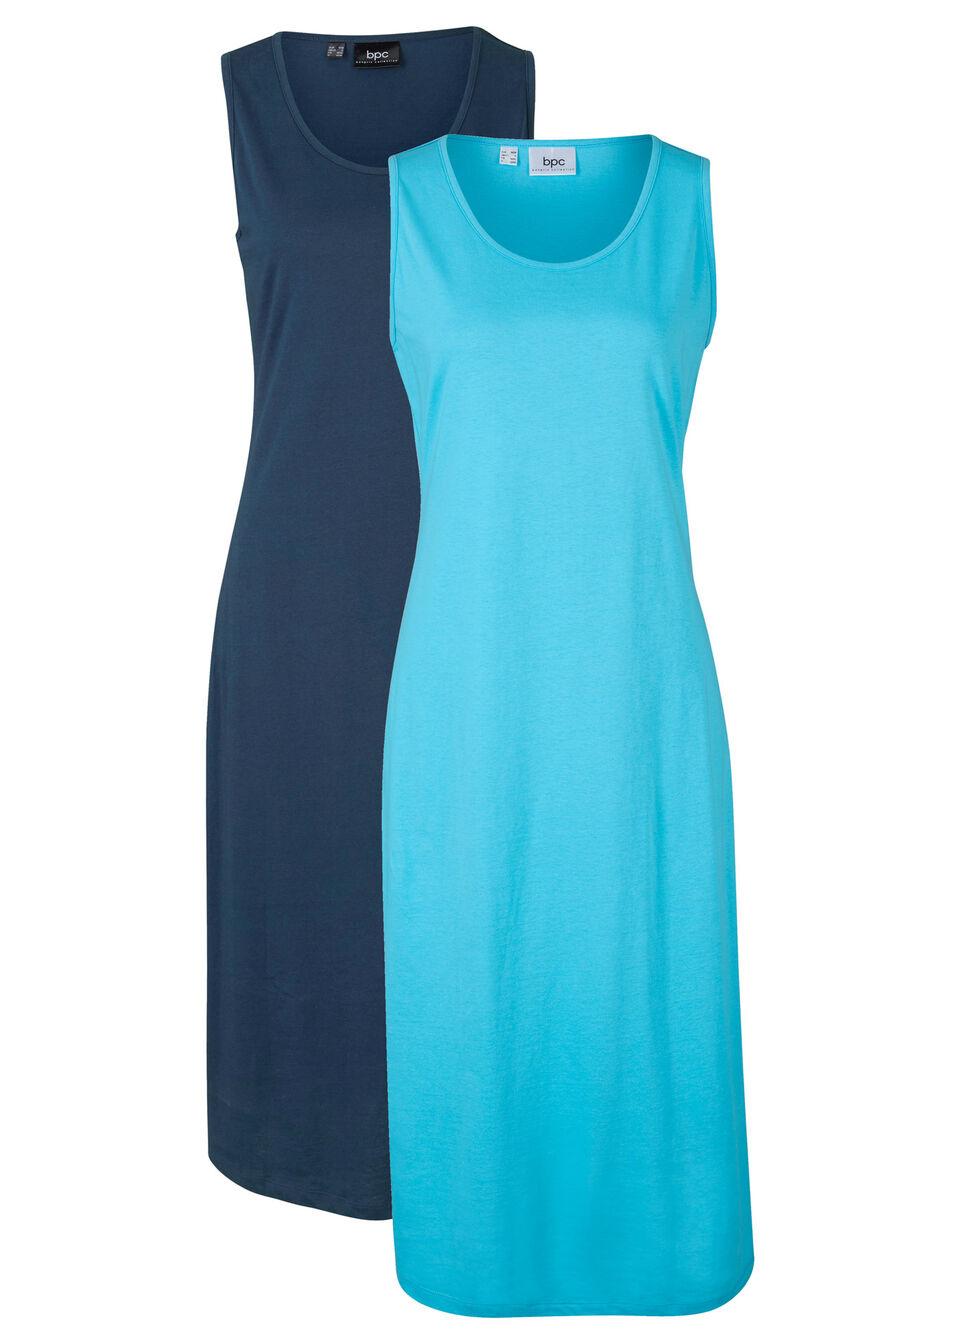 Sukienka midi z dżerseju (2 szt.) bonprix niebieski karaibski + ciemnoniebieski